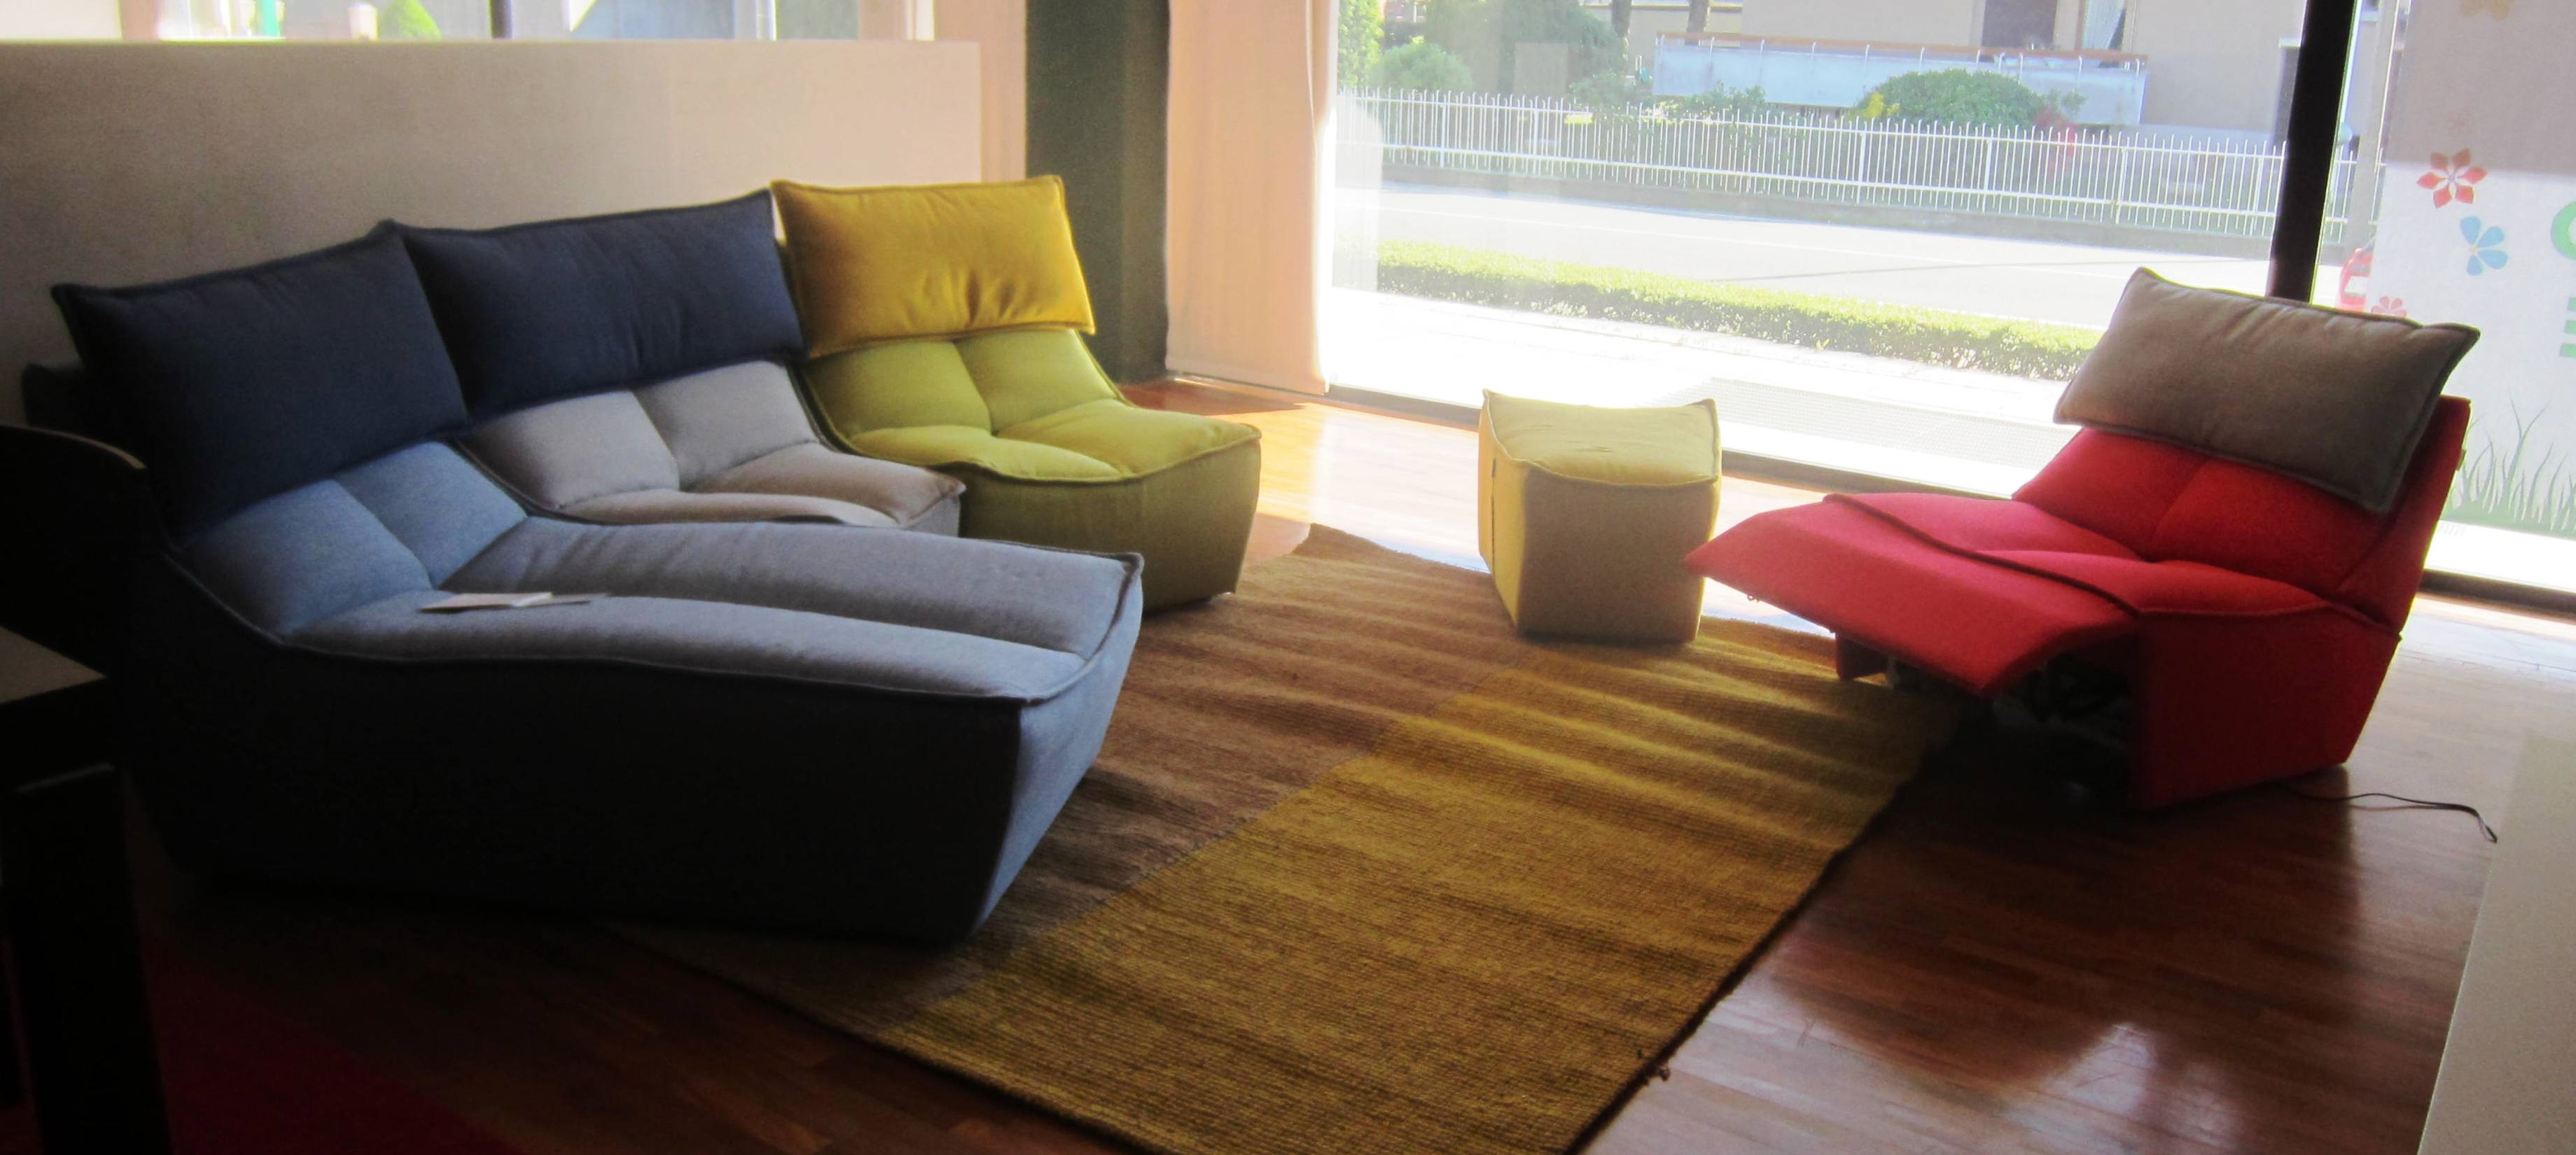 Offertissima divano hip hop divani a prezzi scontati - Divano divani prezzi ...